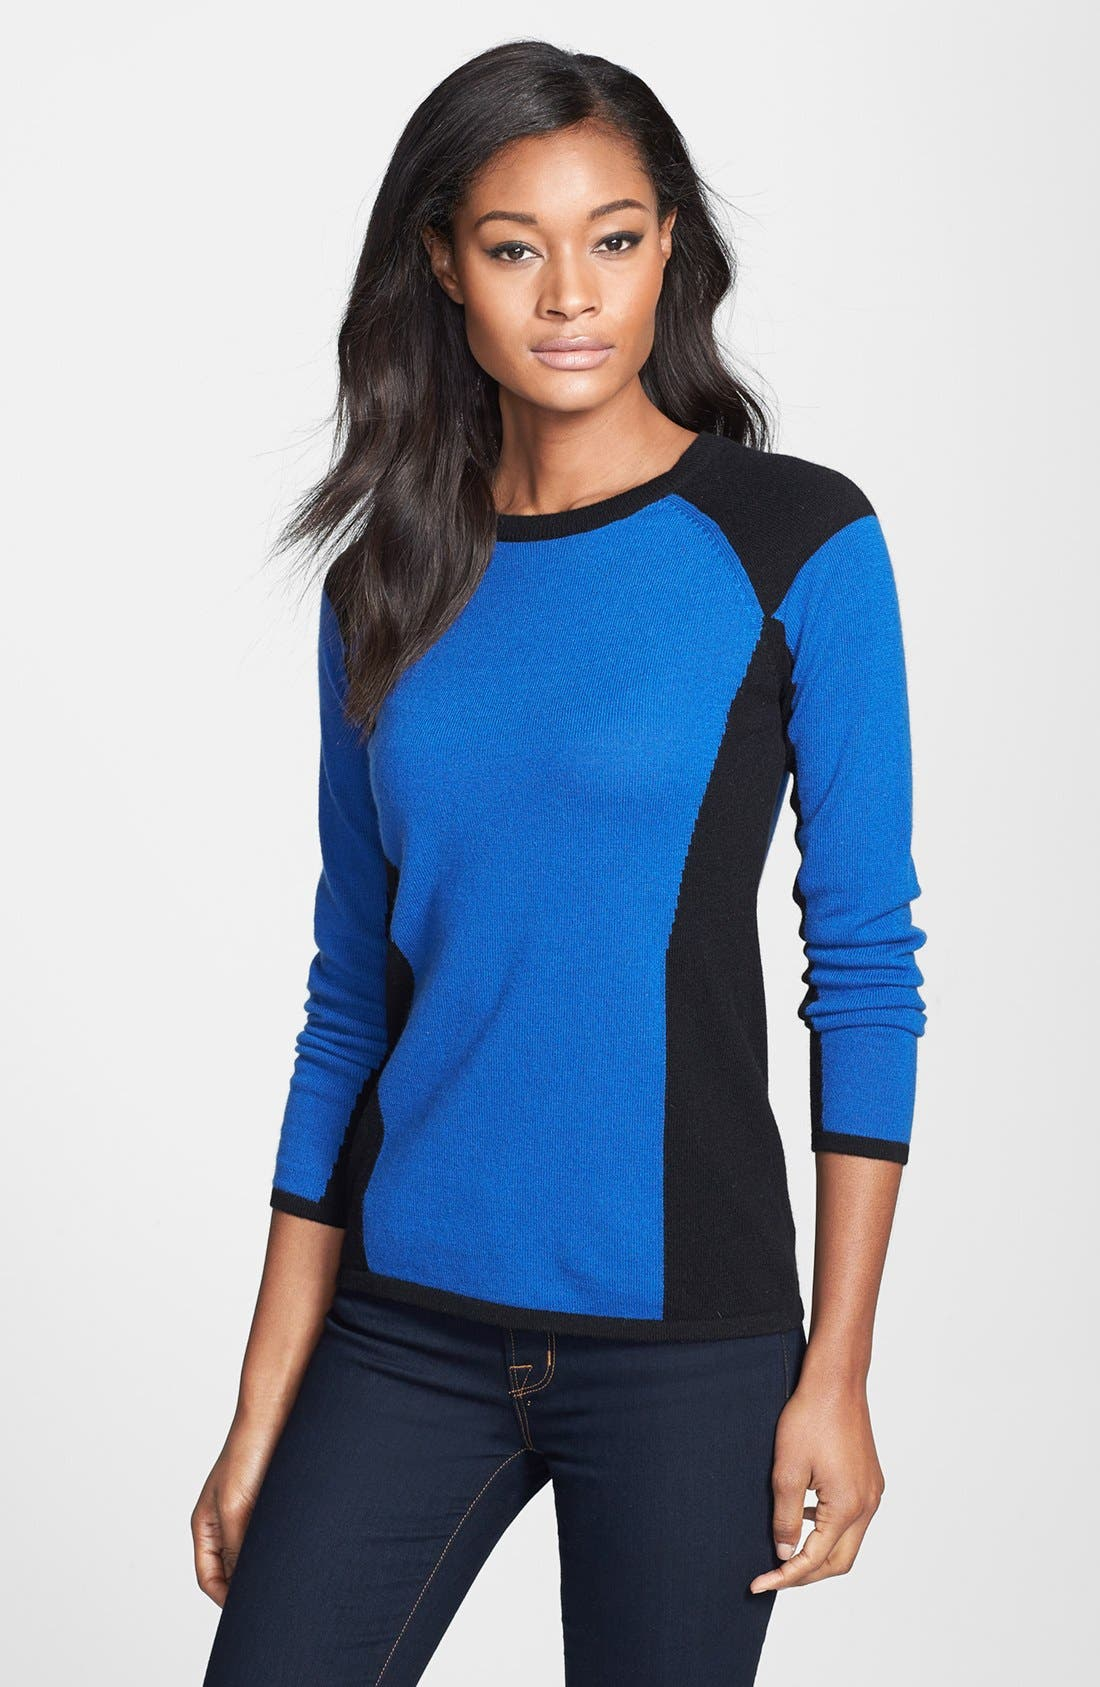 Main Image - Lauren Hansen Colorblock Cashmere Pullover